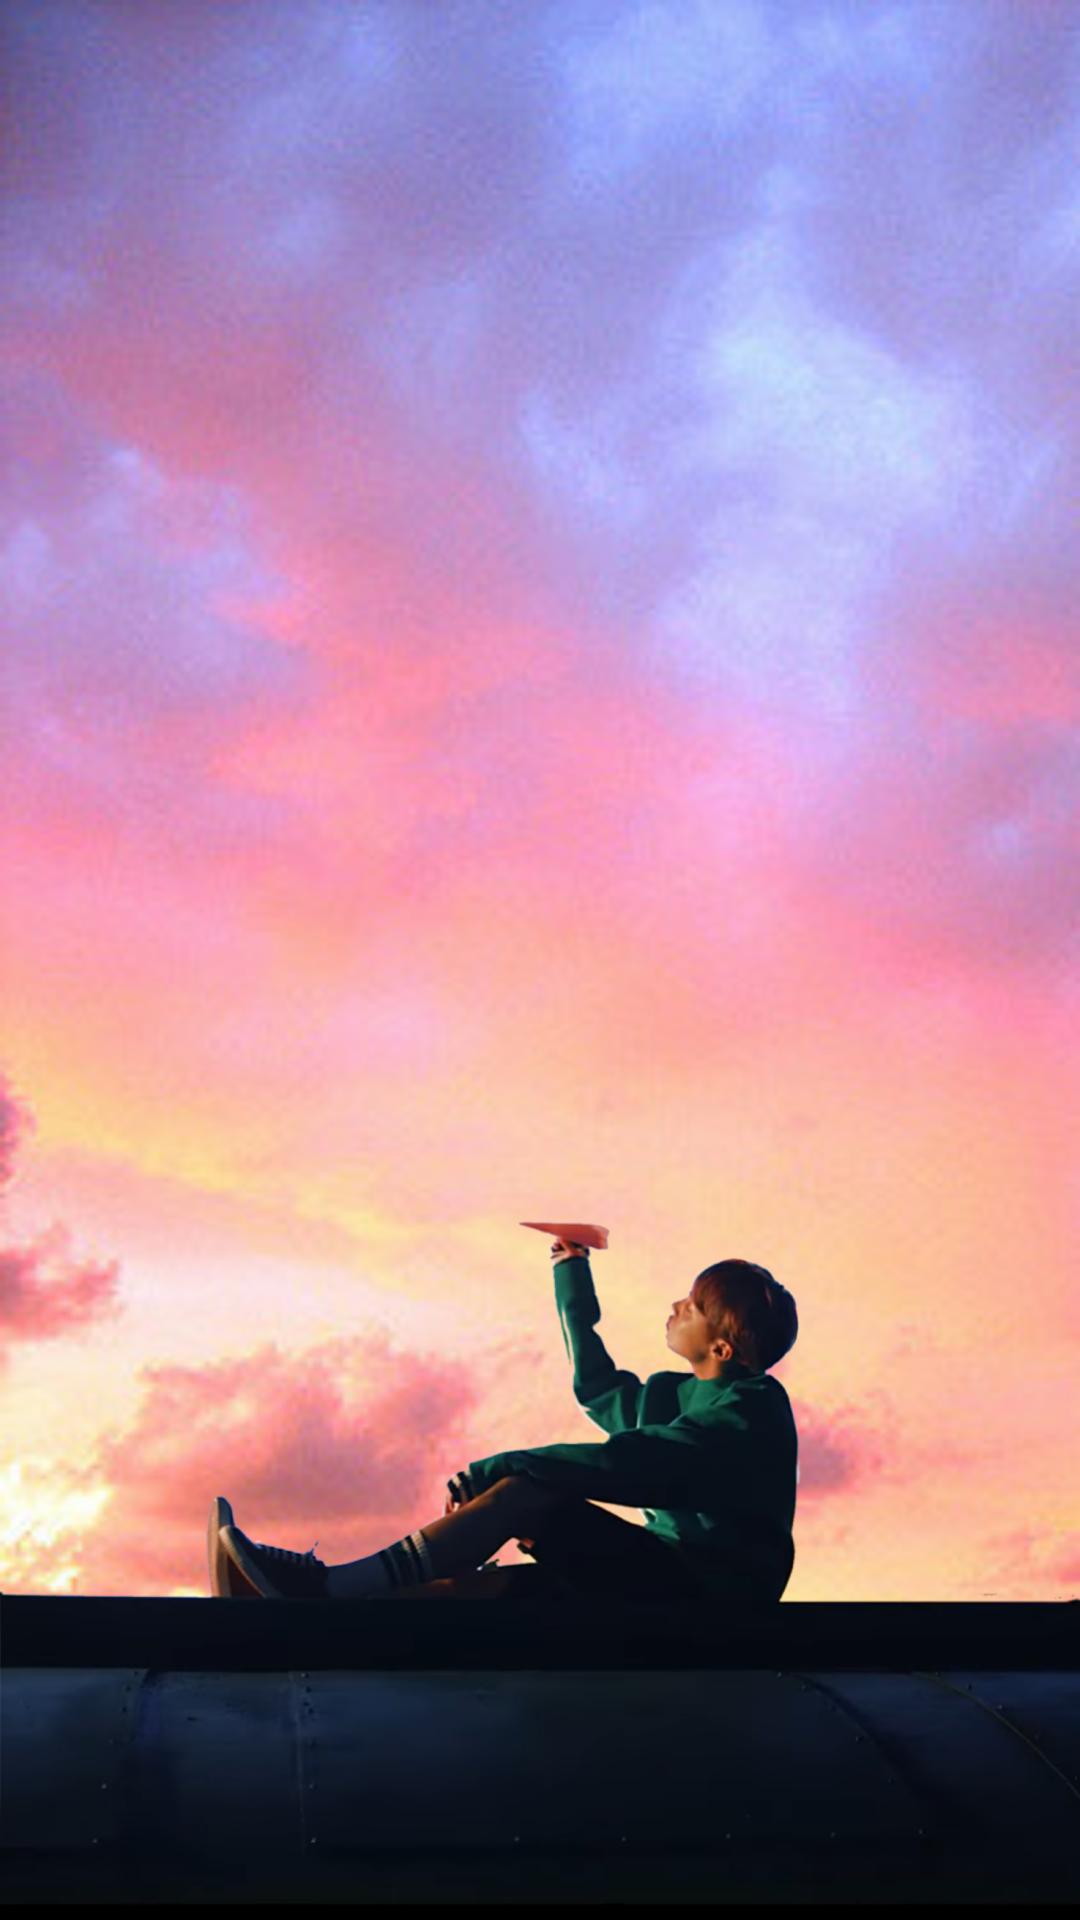 jin wallpaper Tumblr Bts wings wallpaper, Bts lockscreen